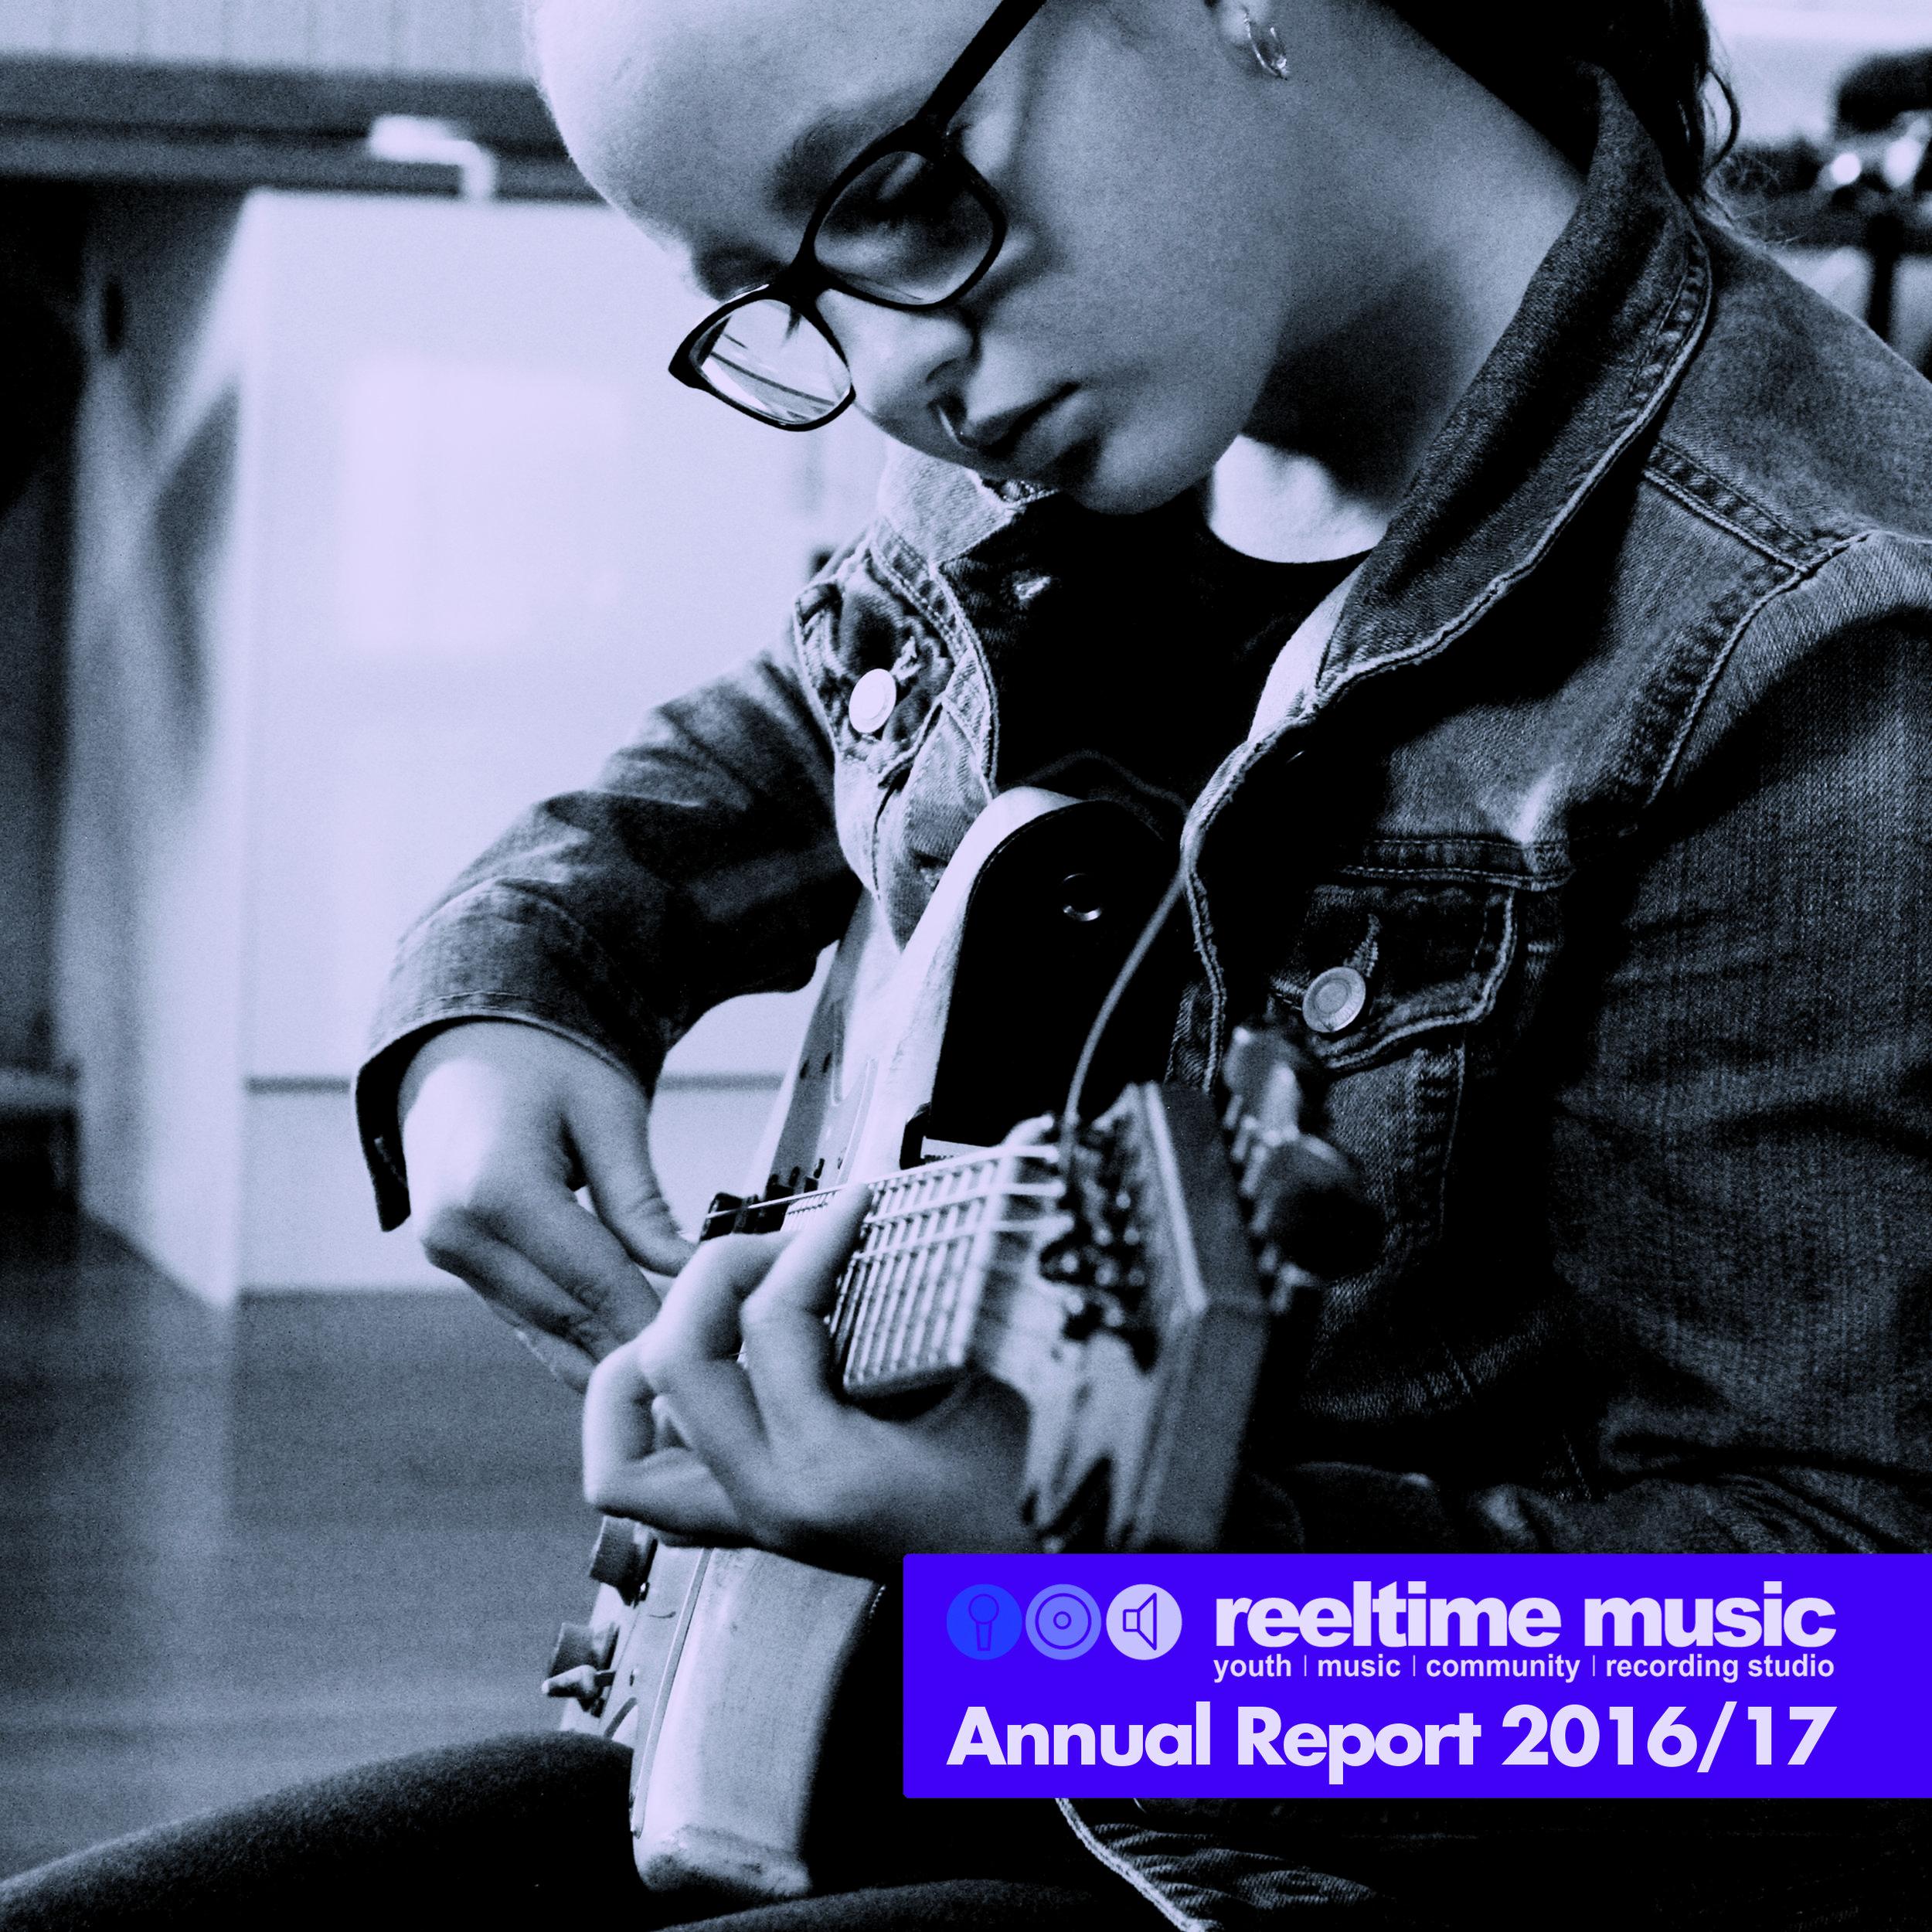 Annual Report 2016/17 -